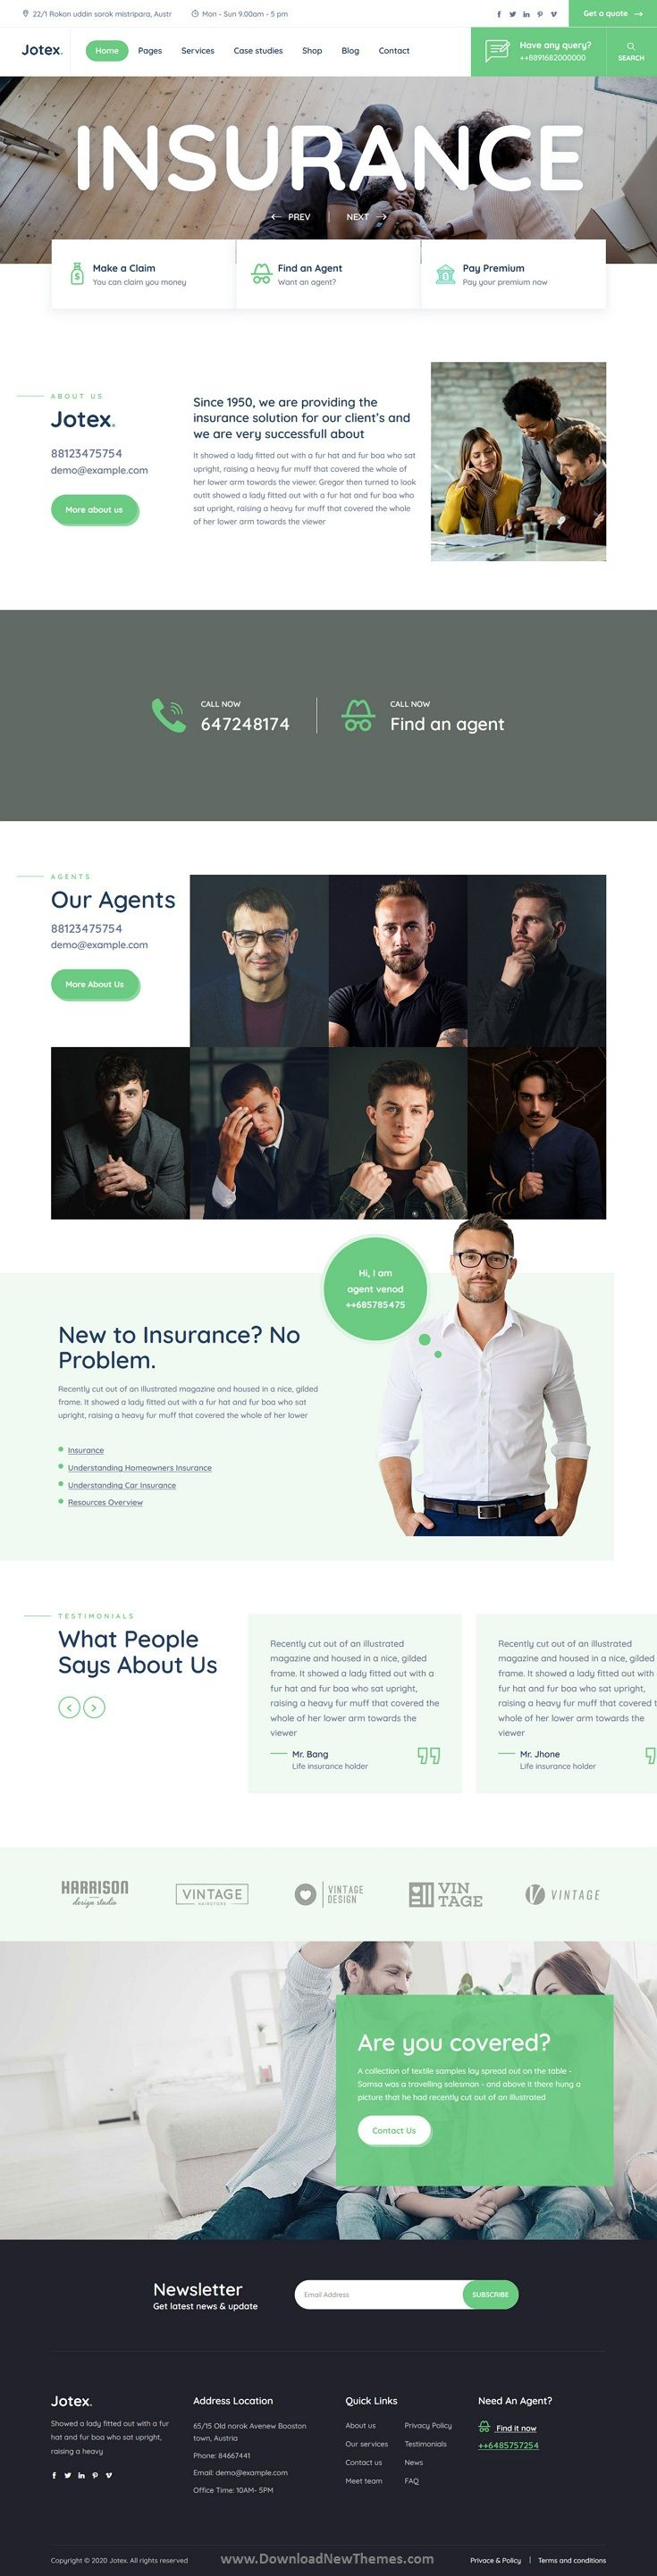 Responsive Insurance Business WordPress Theme in 2020